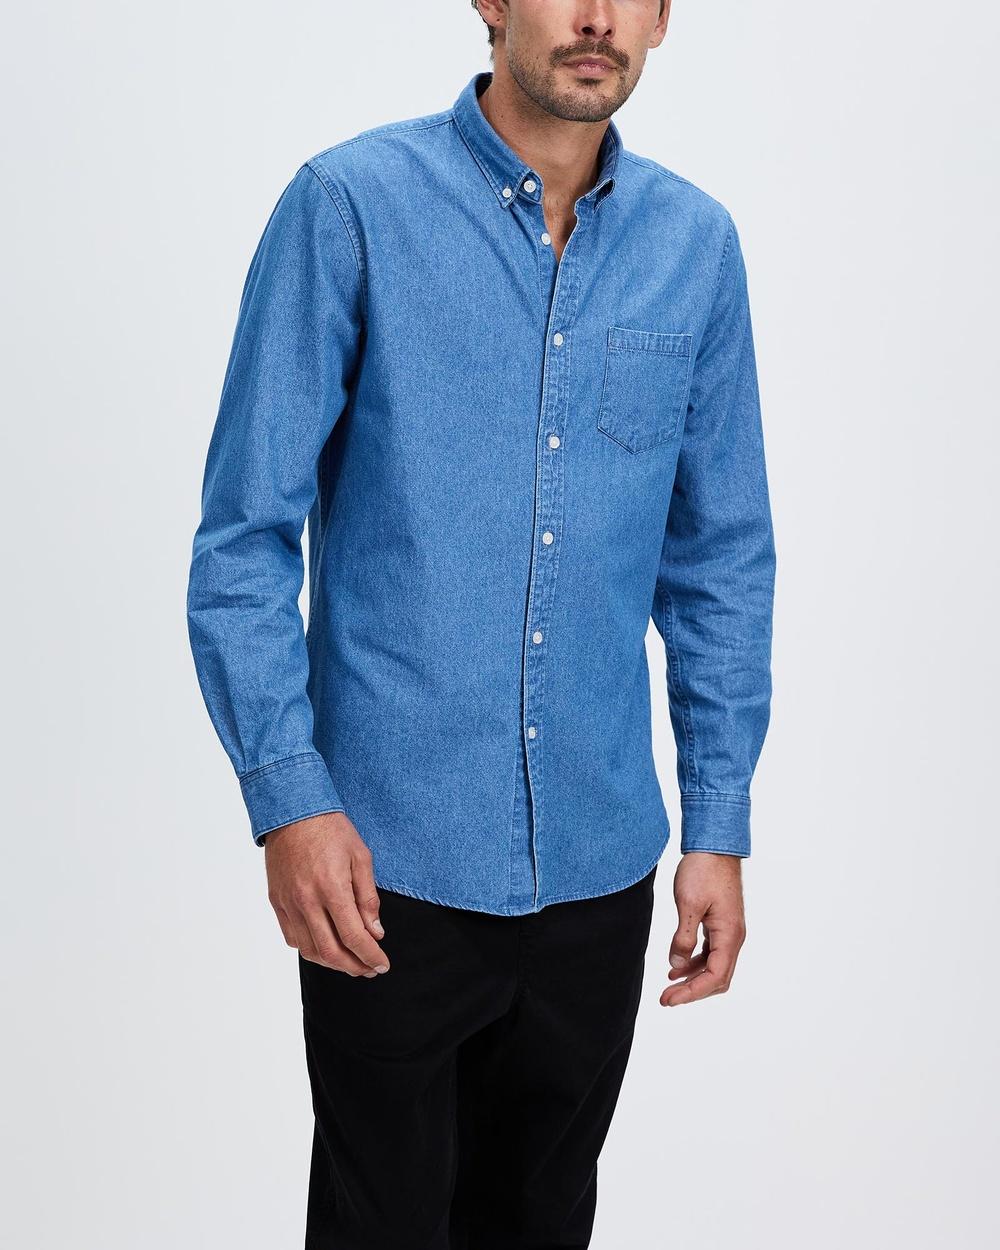 Marcs Duke Reg Shirt Casual shirts MID WASH